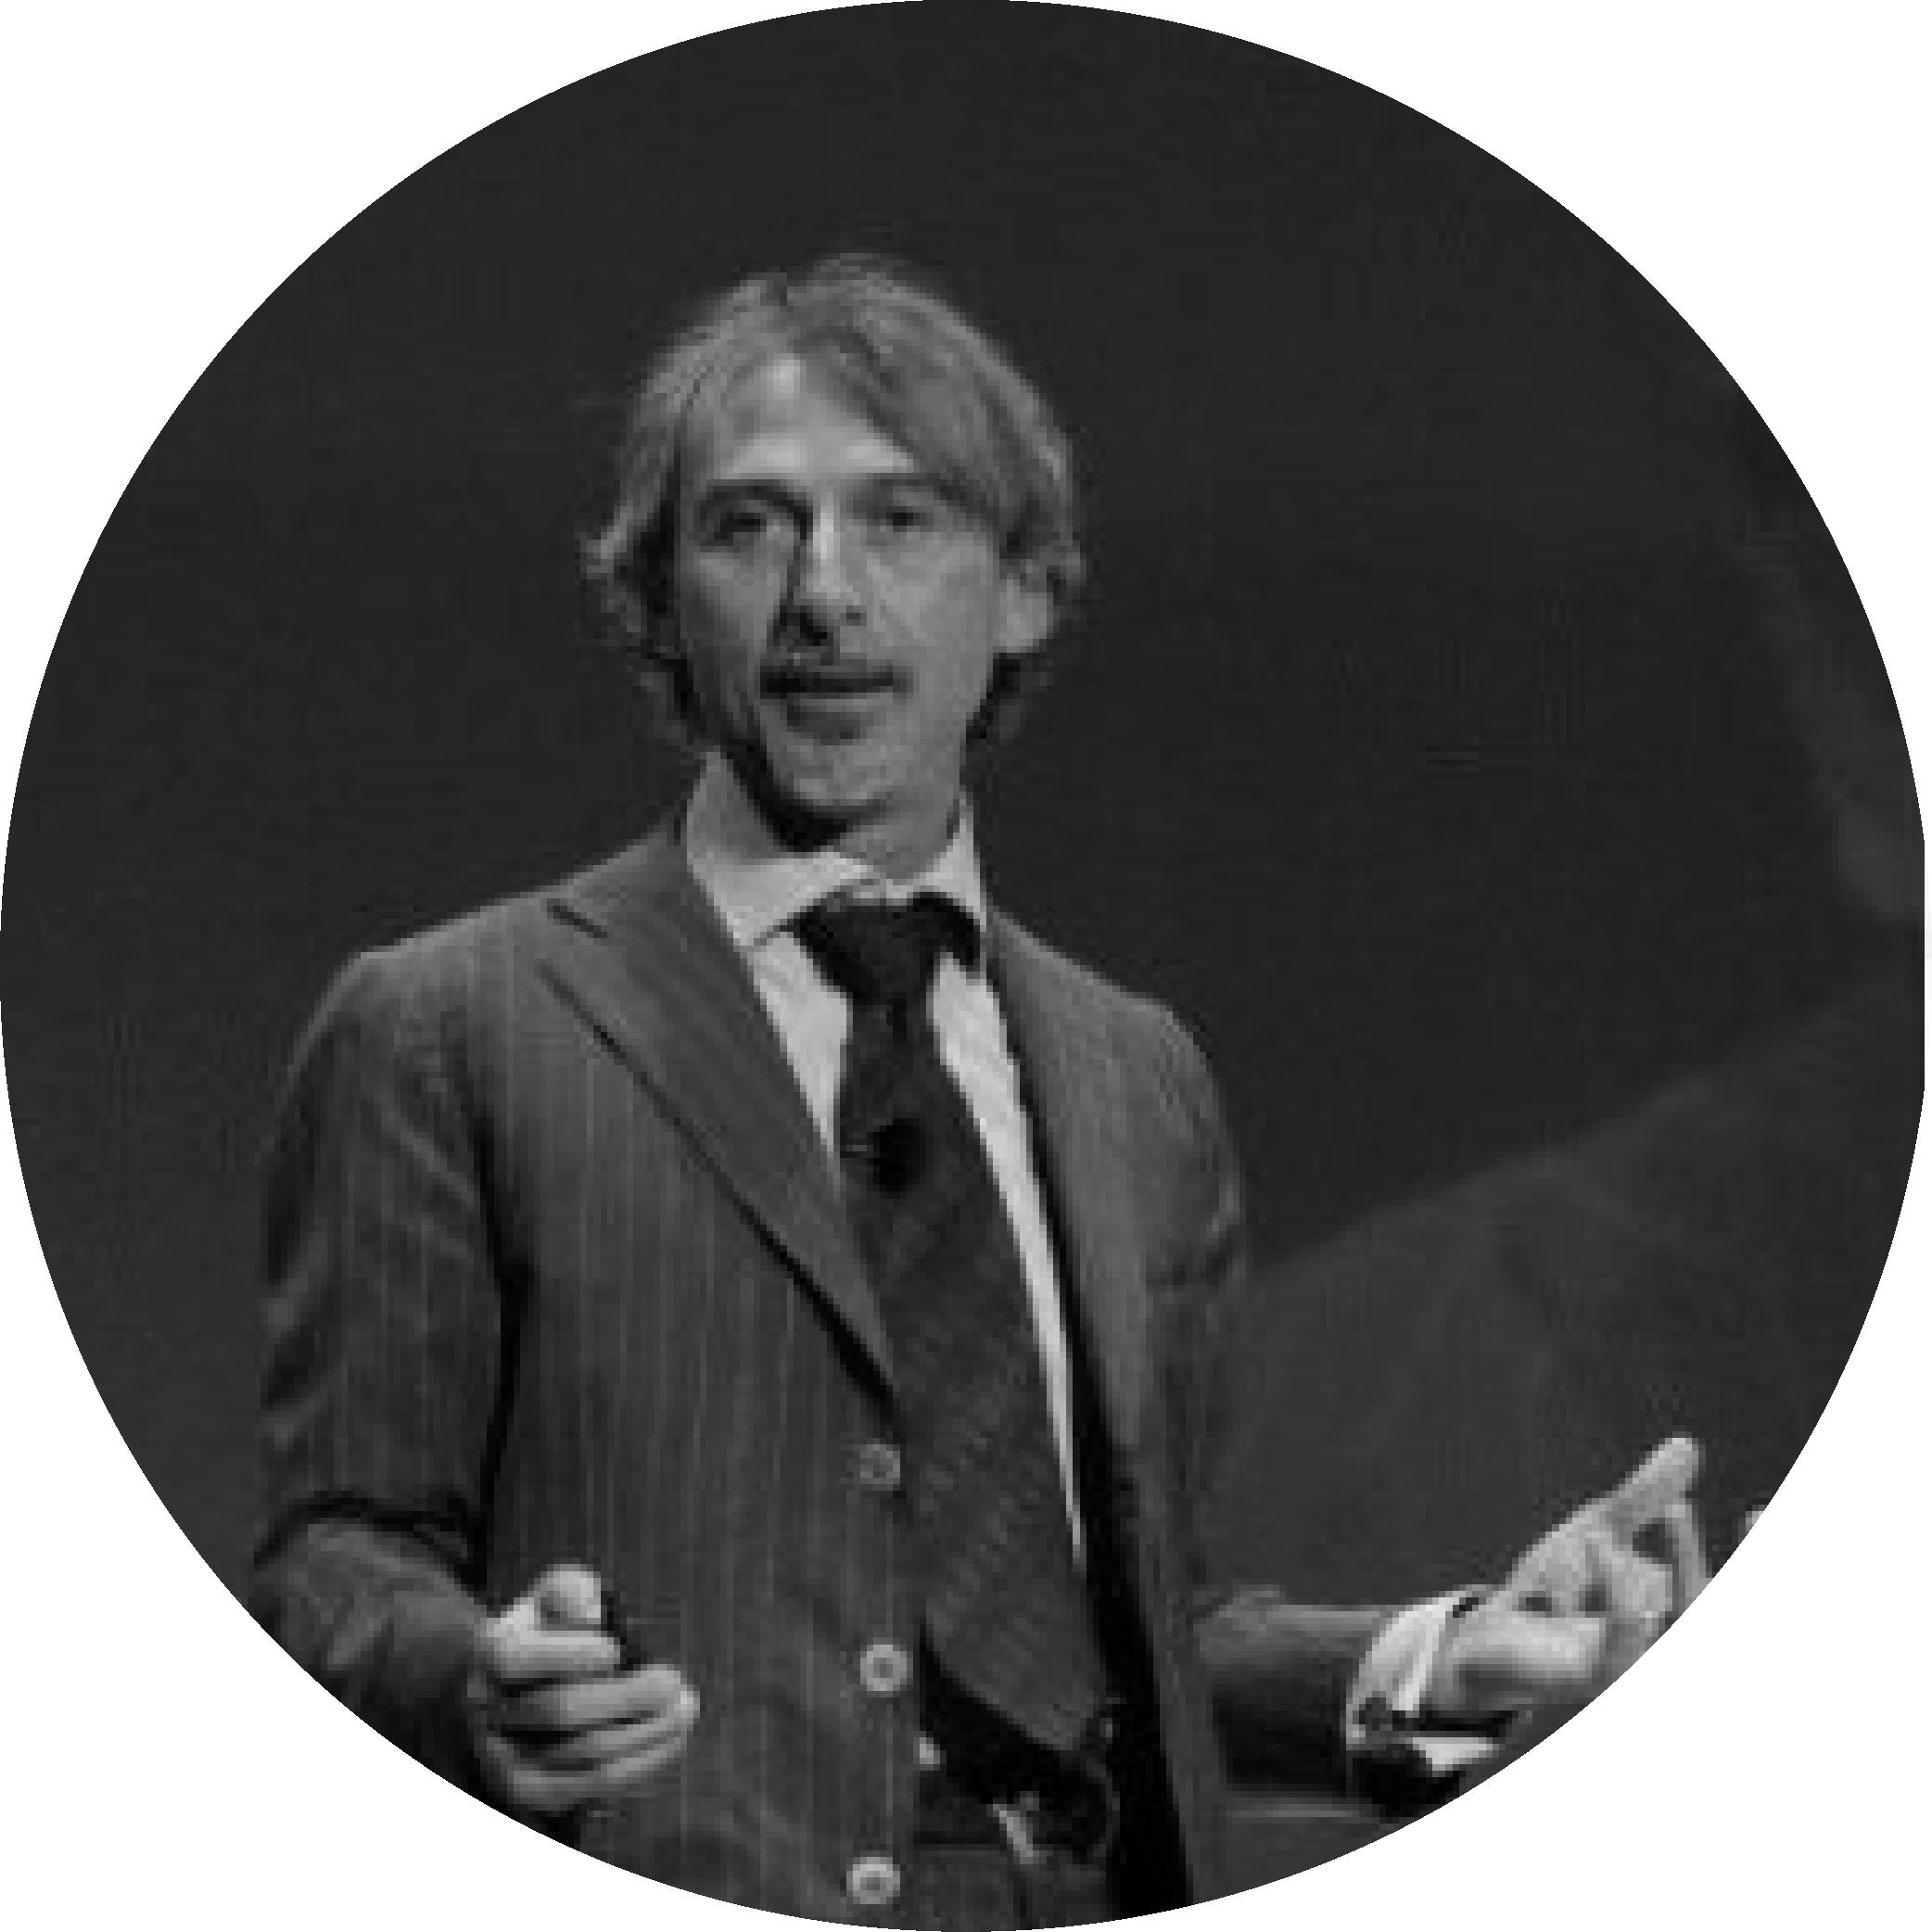 Davide Zucchetti